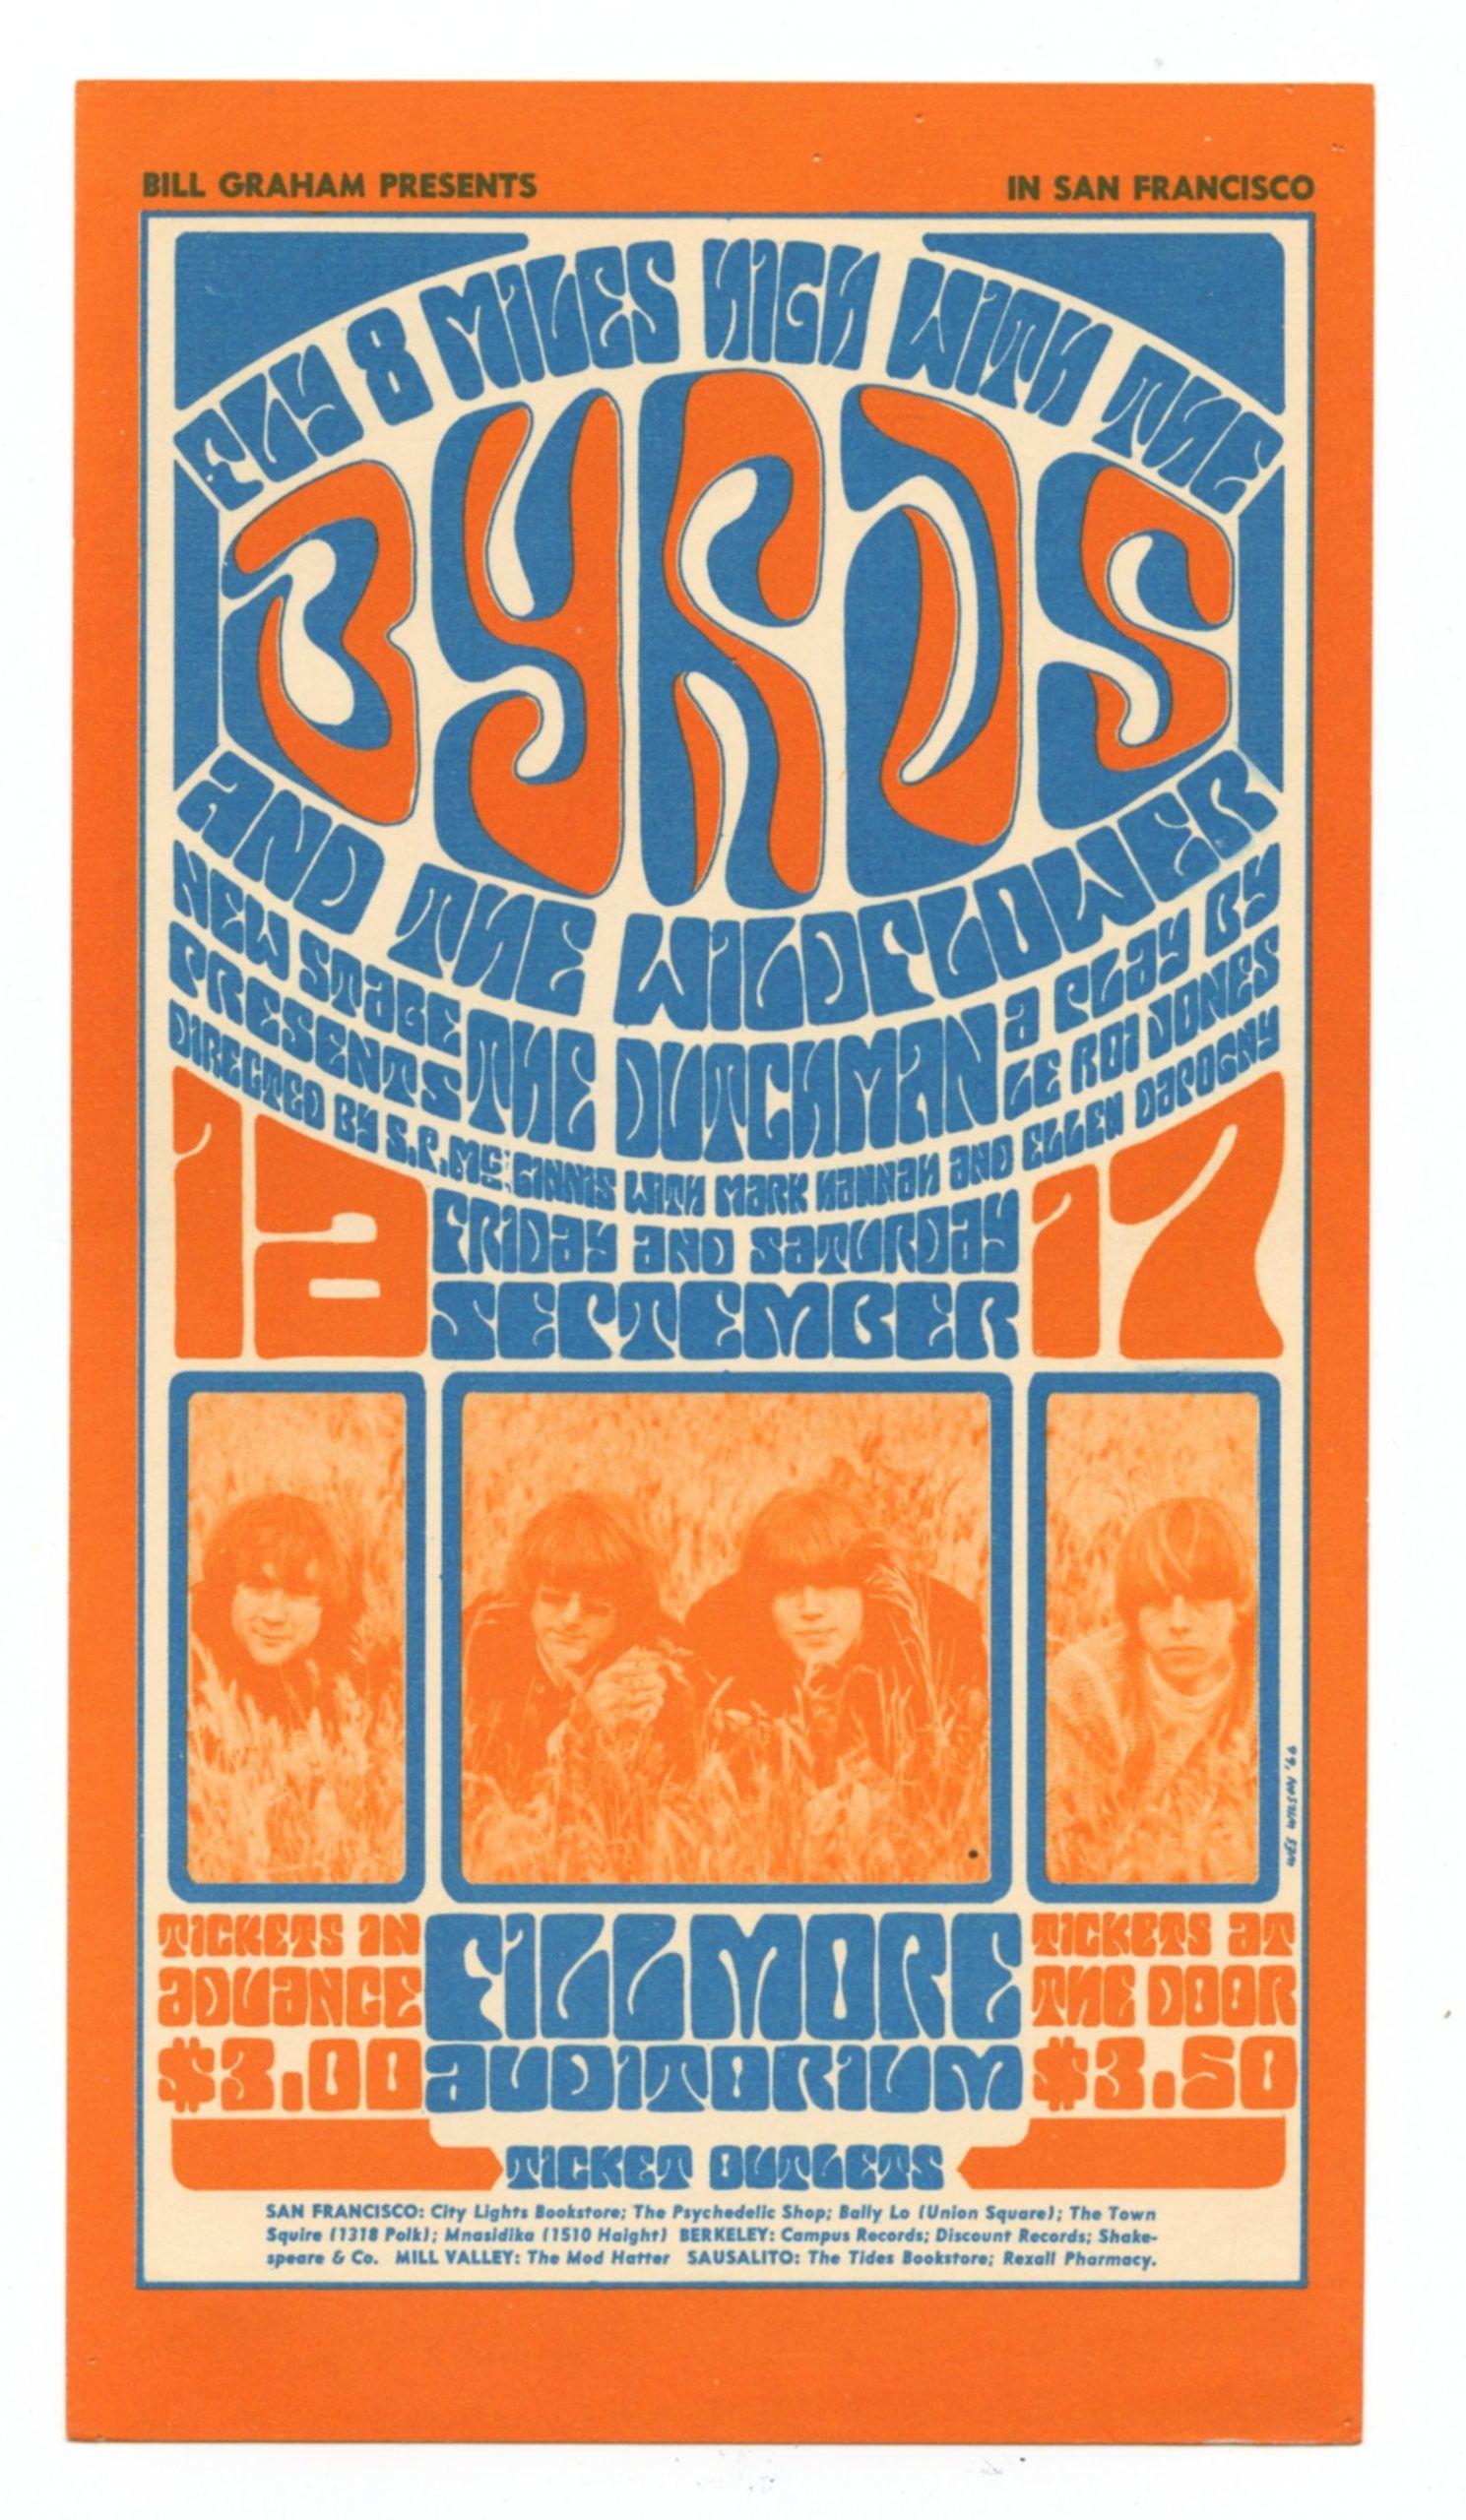 BG  28 Handbill The Byrds Wildflower 1966 Sep 16